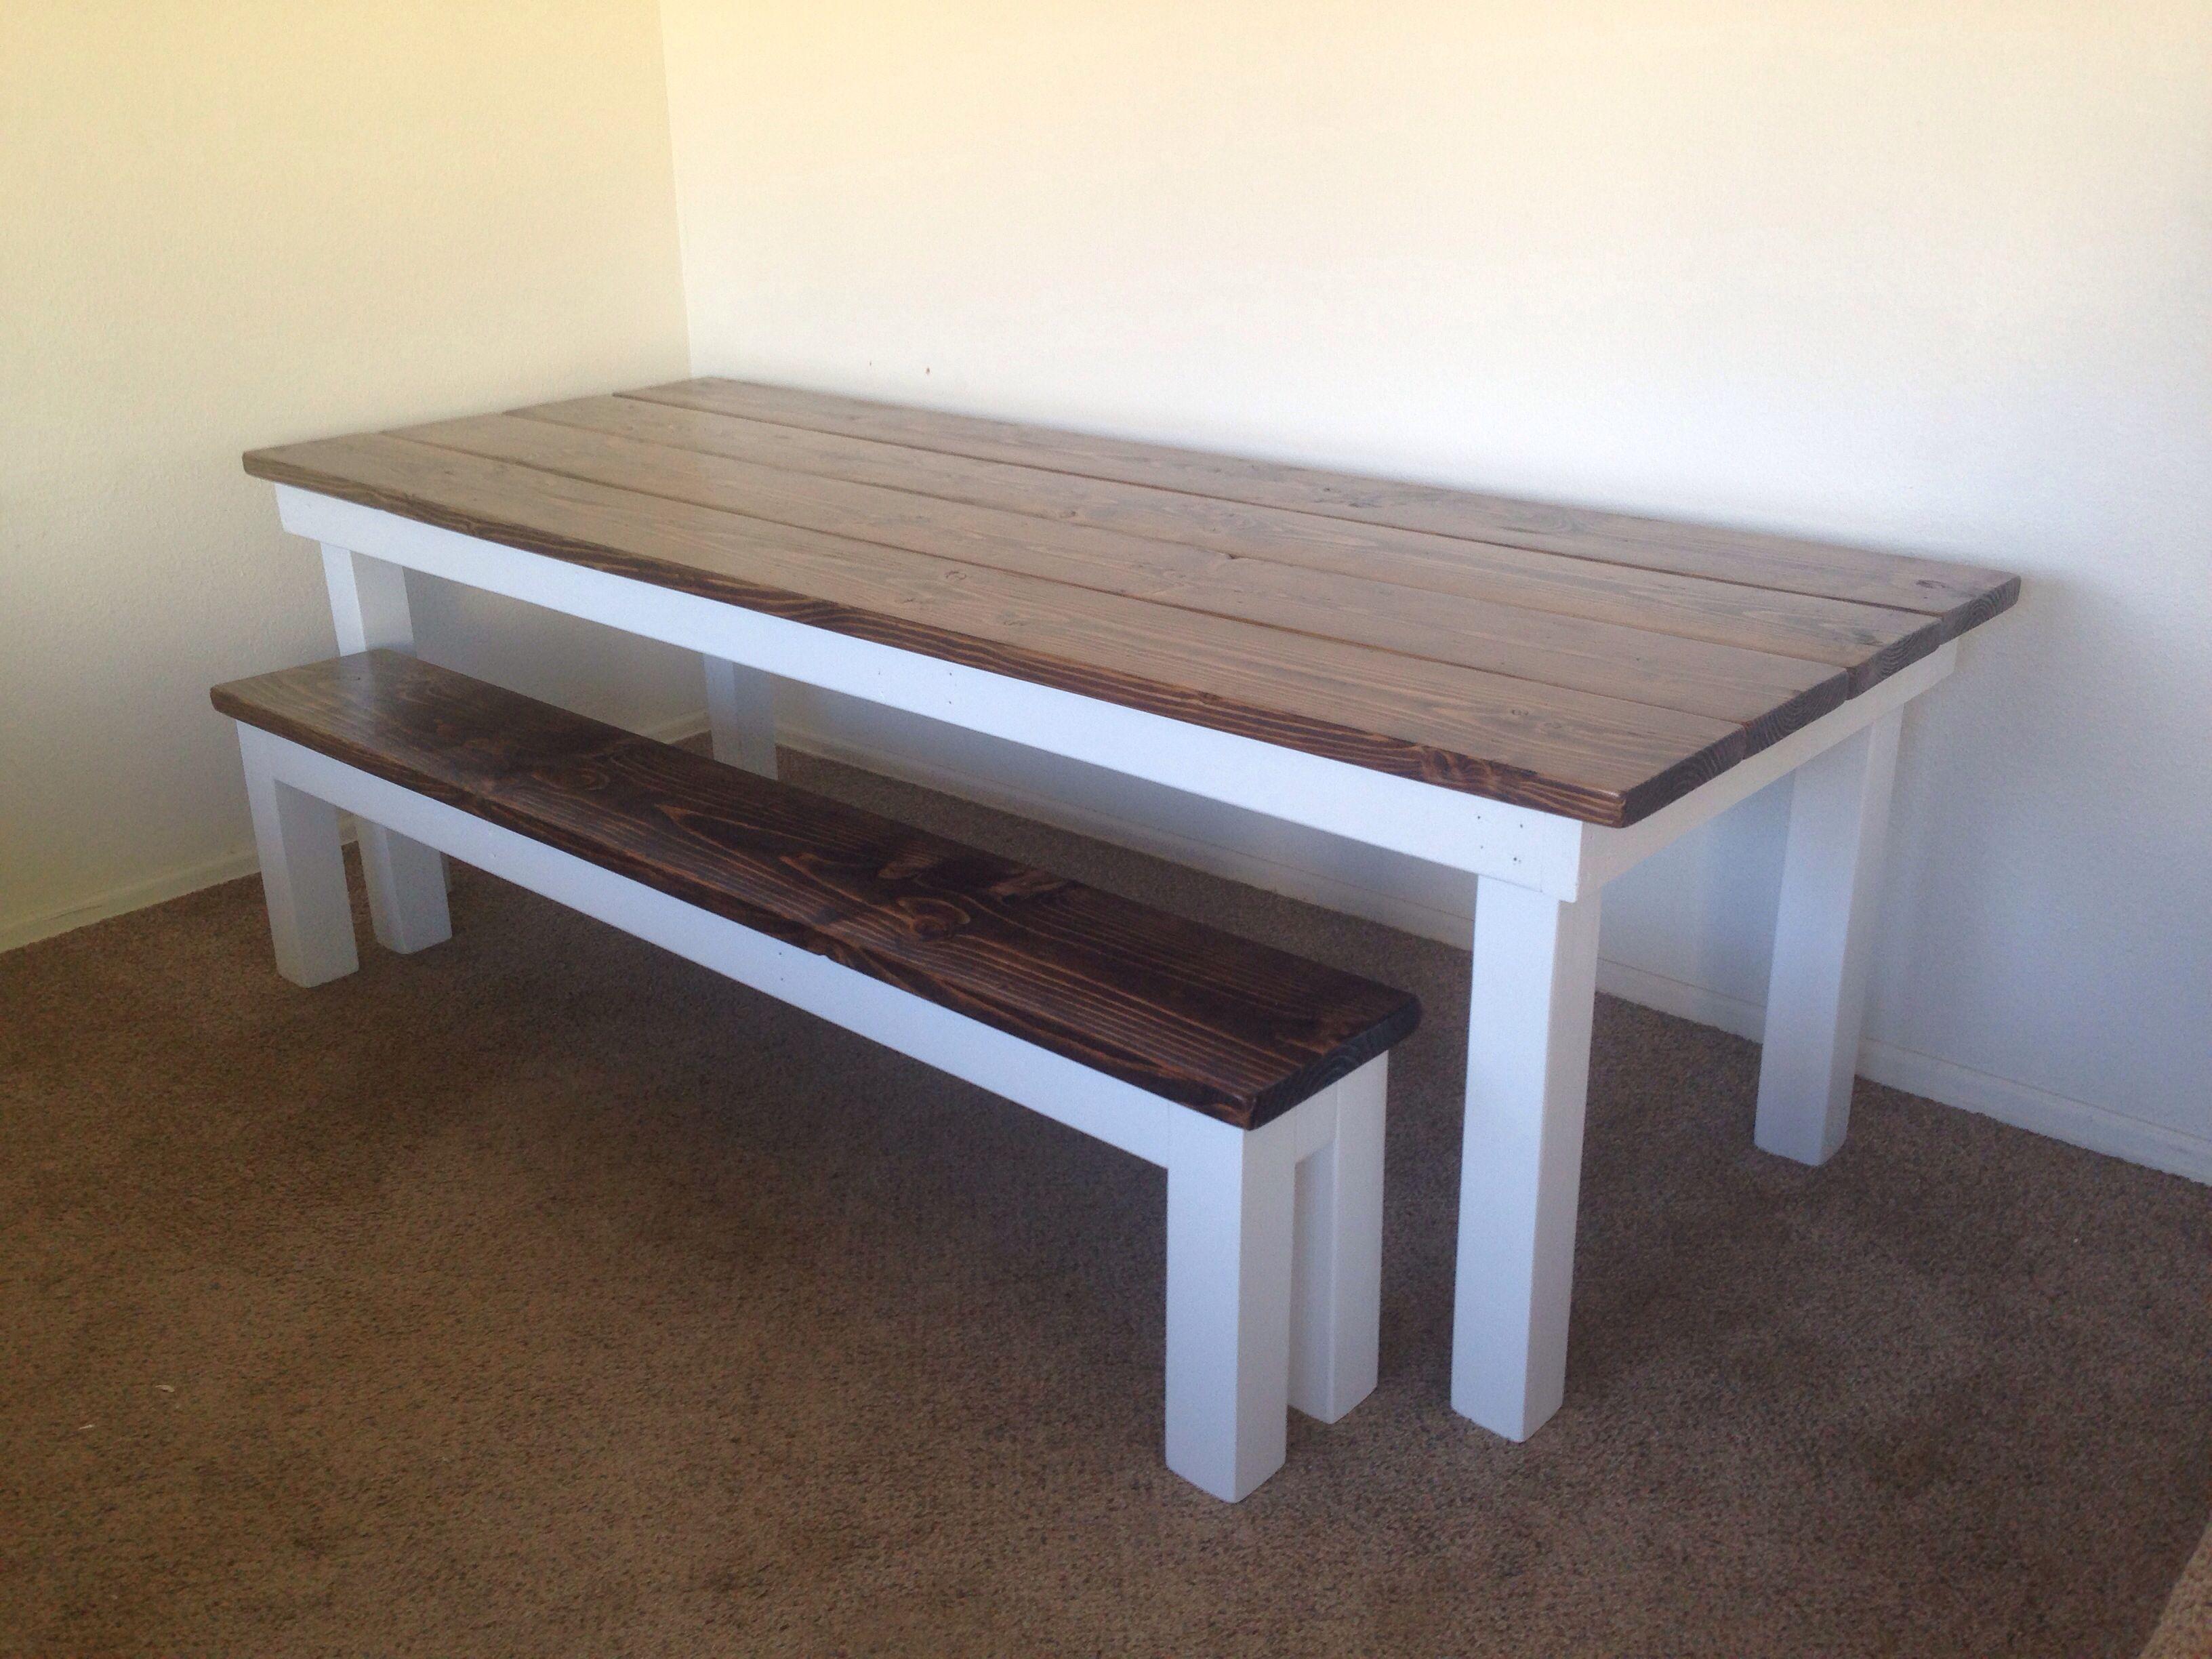 Custom planked top farmhouse table with dark walnut stain